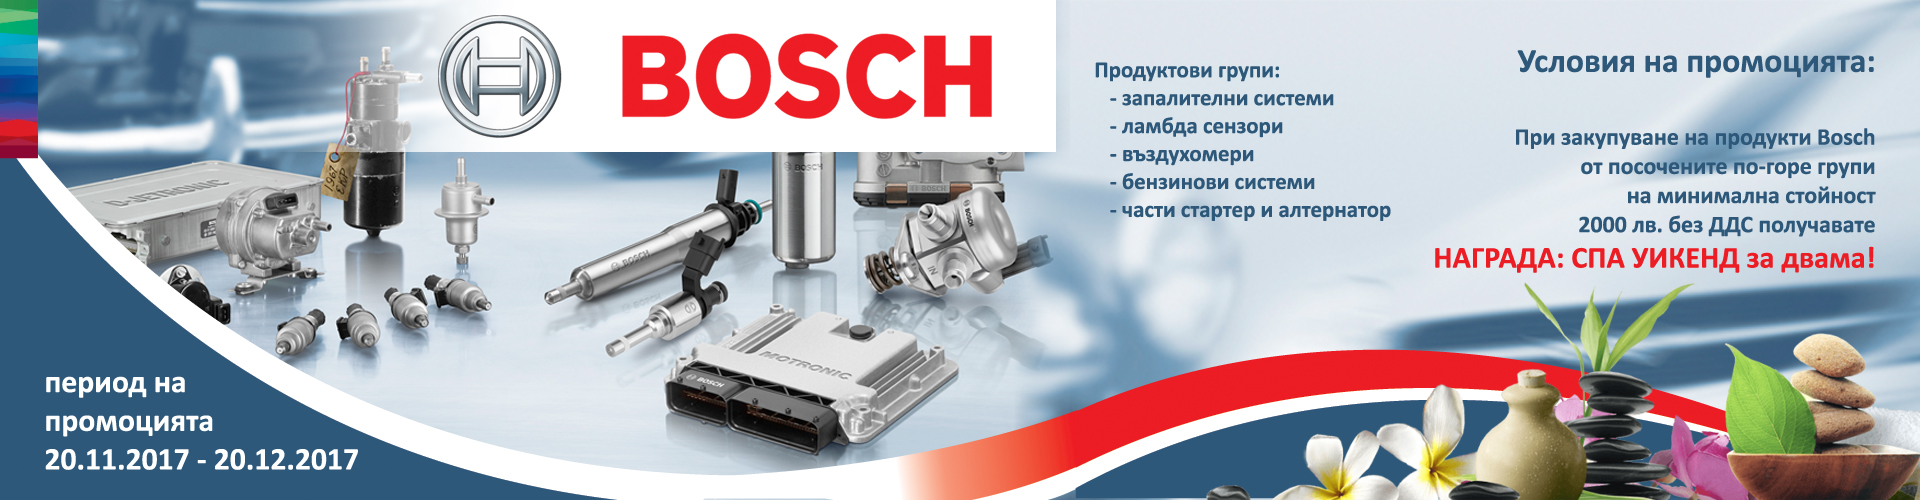 promotion_bosch_20-11-2017_to_20-12-2017_banner.jpg